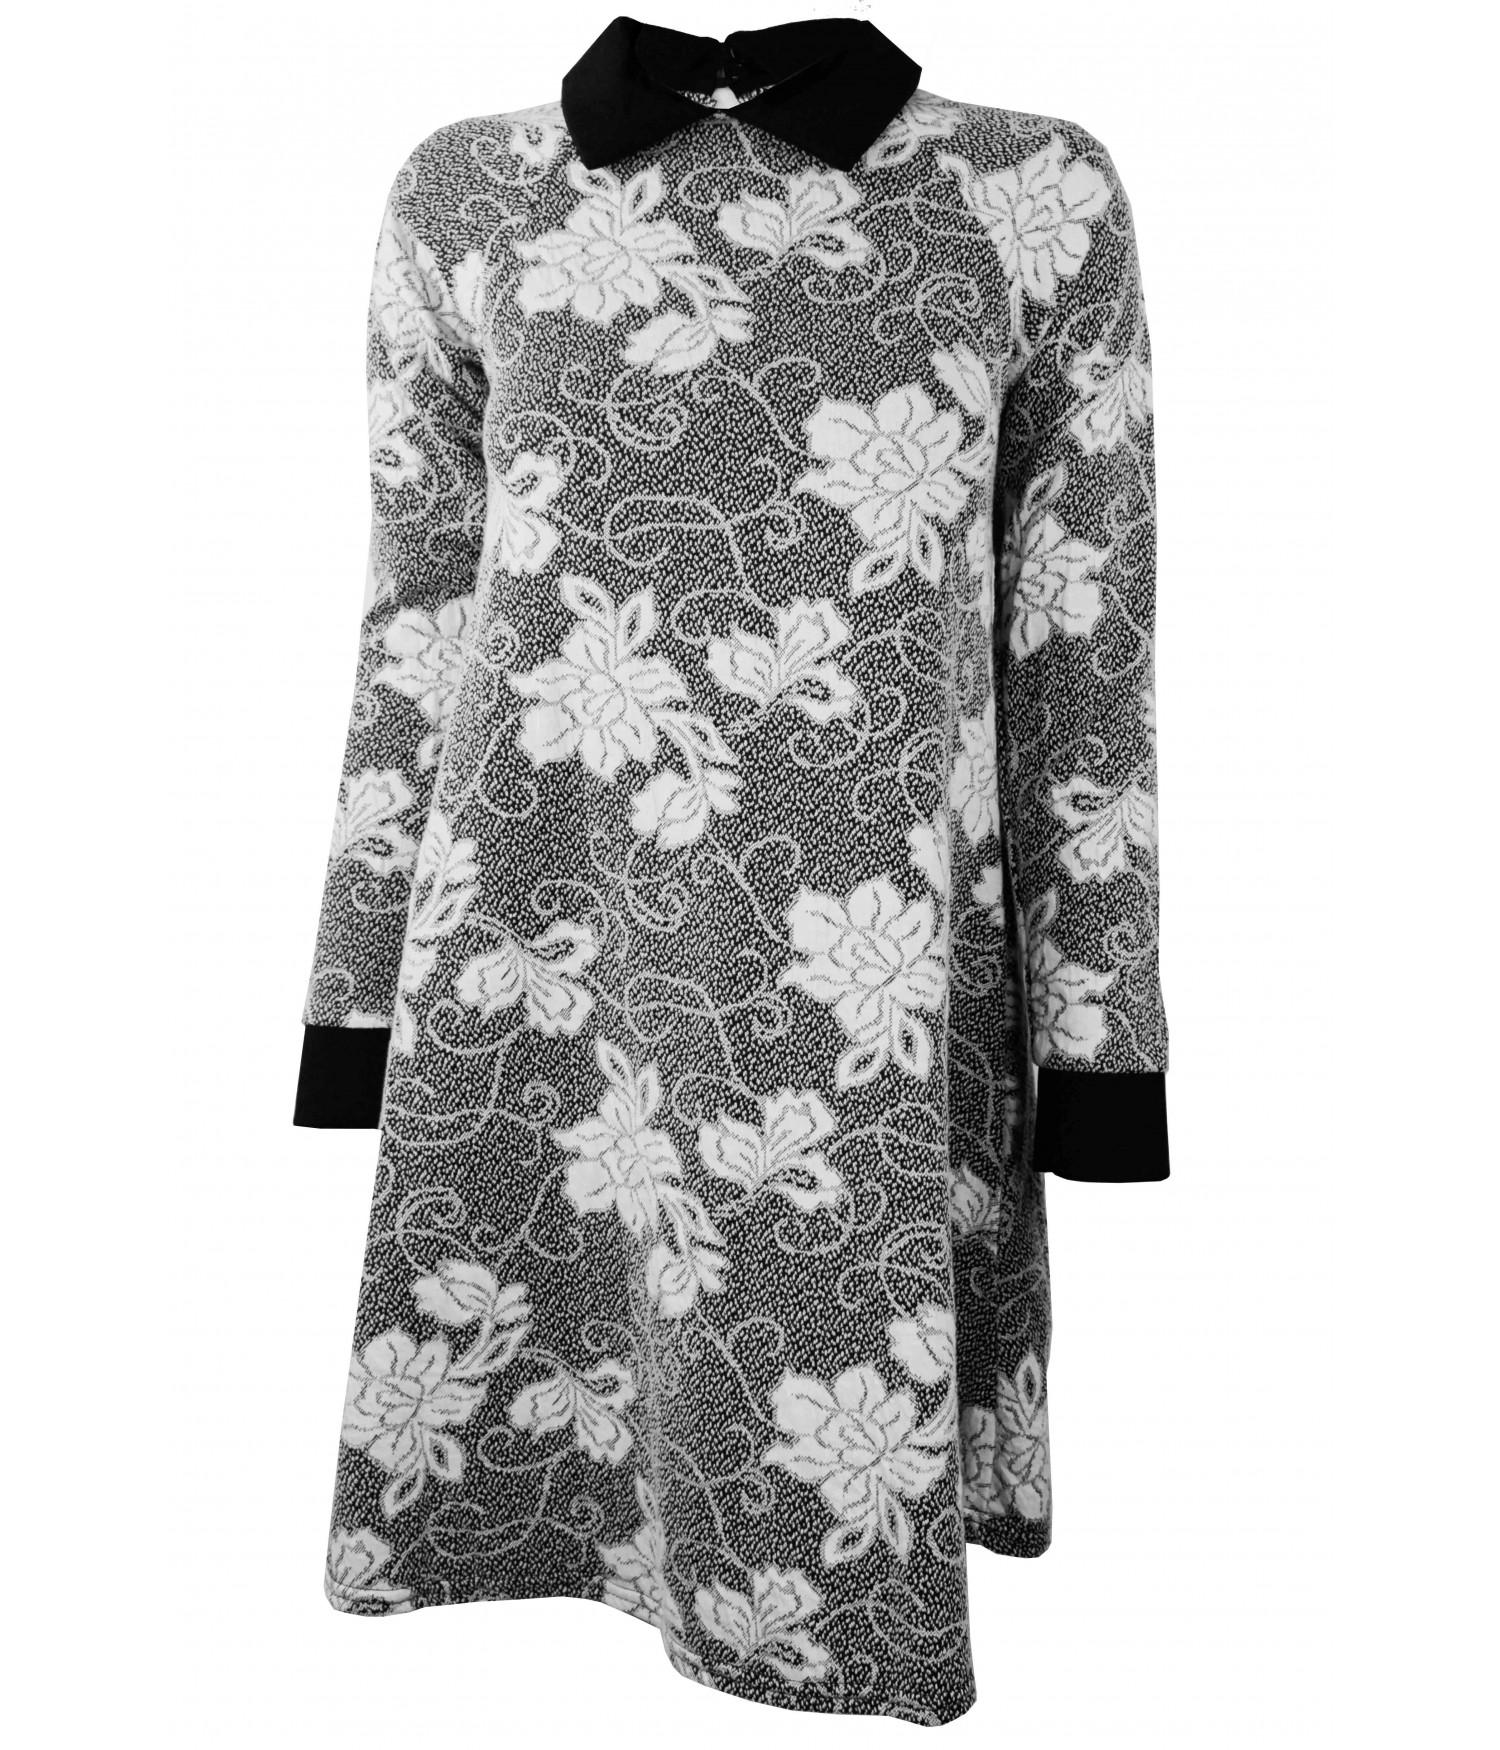 Kristin floral black swing dress